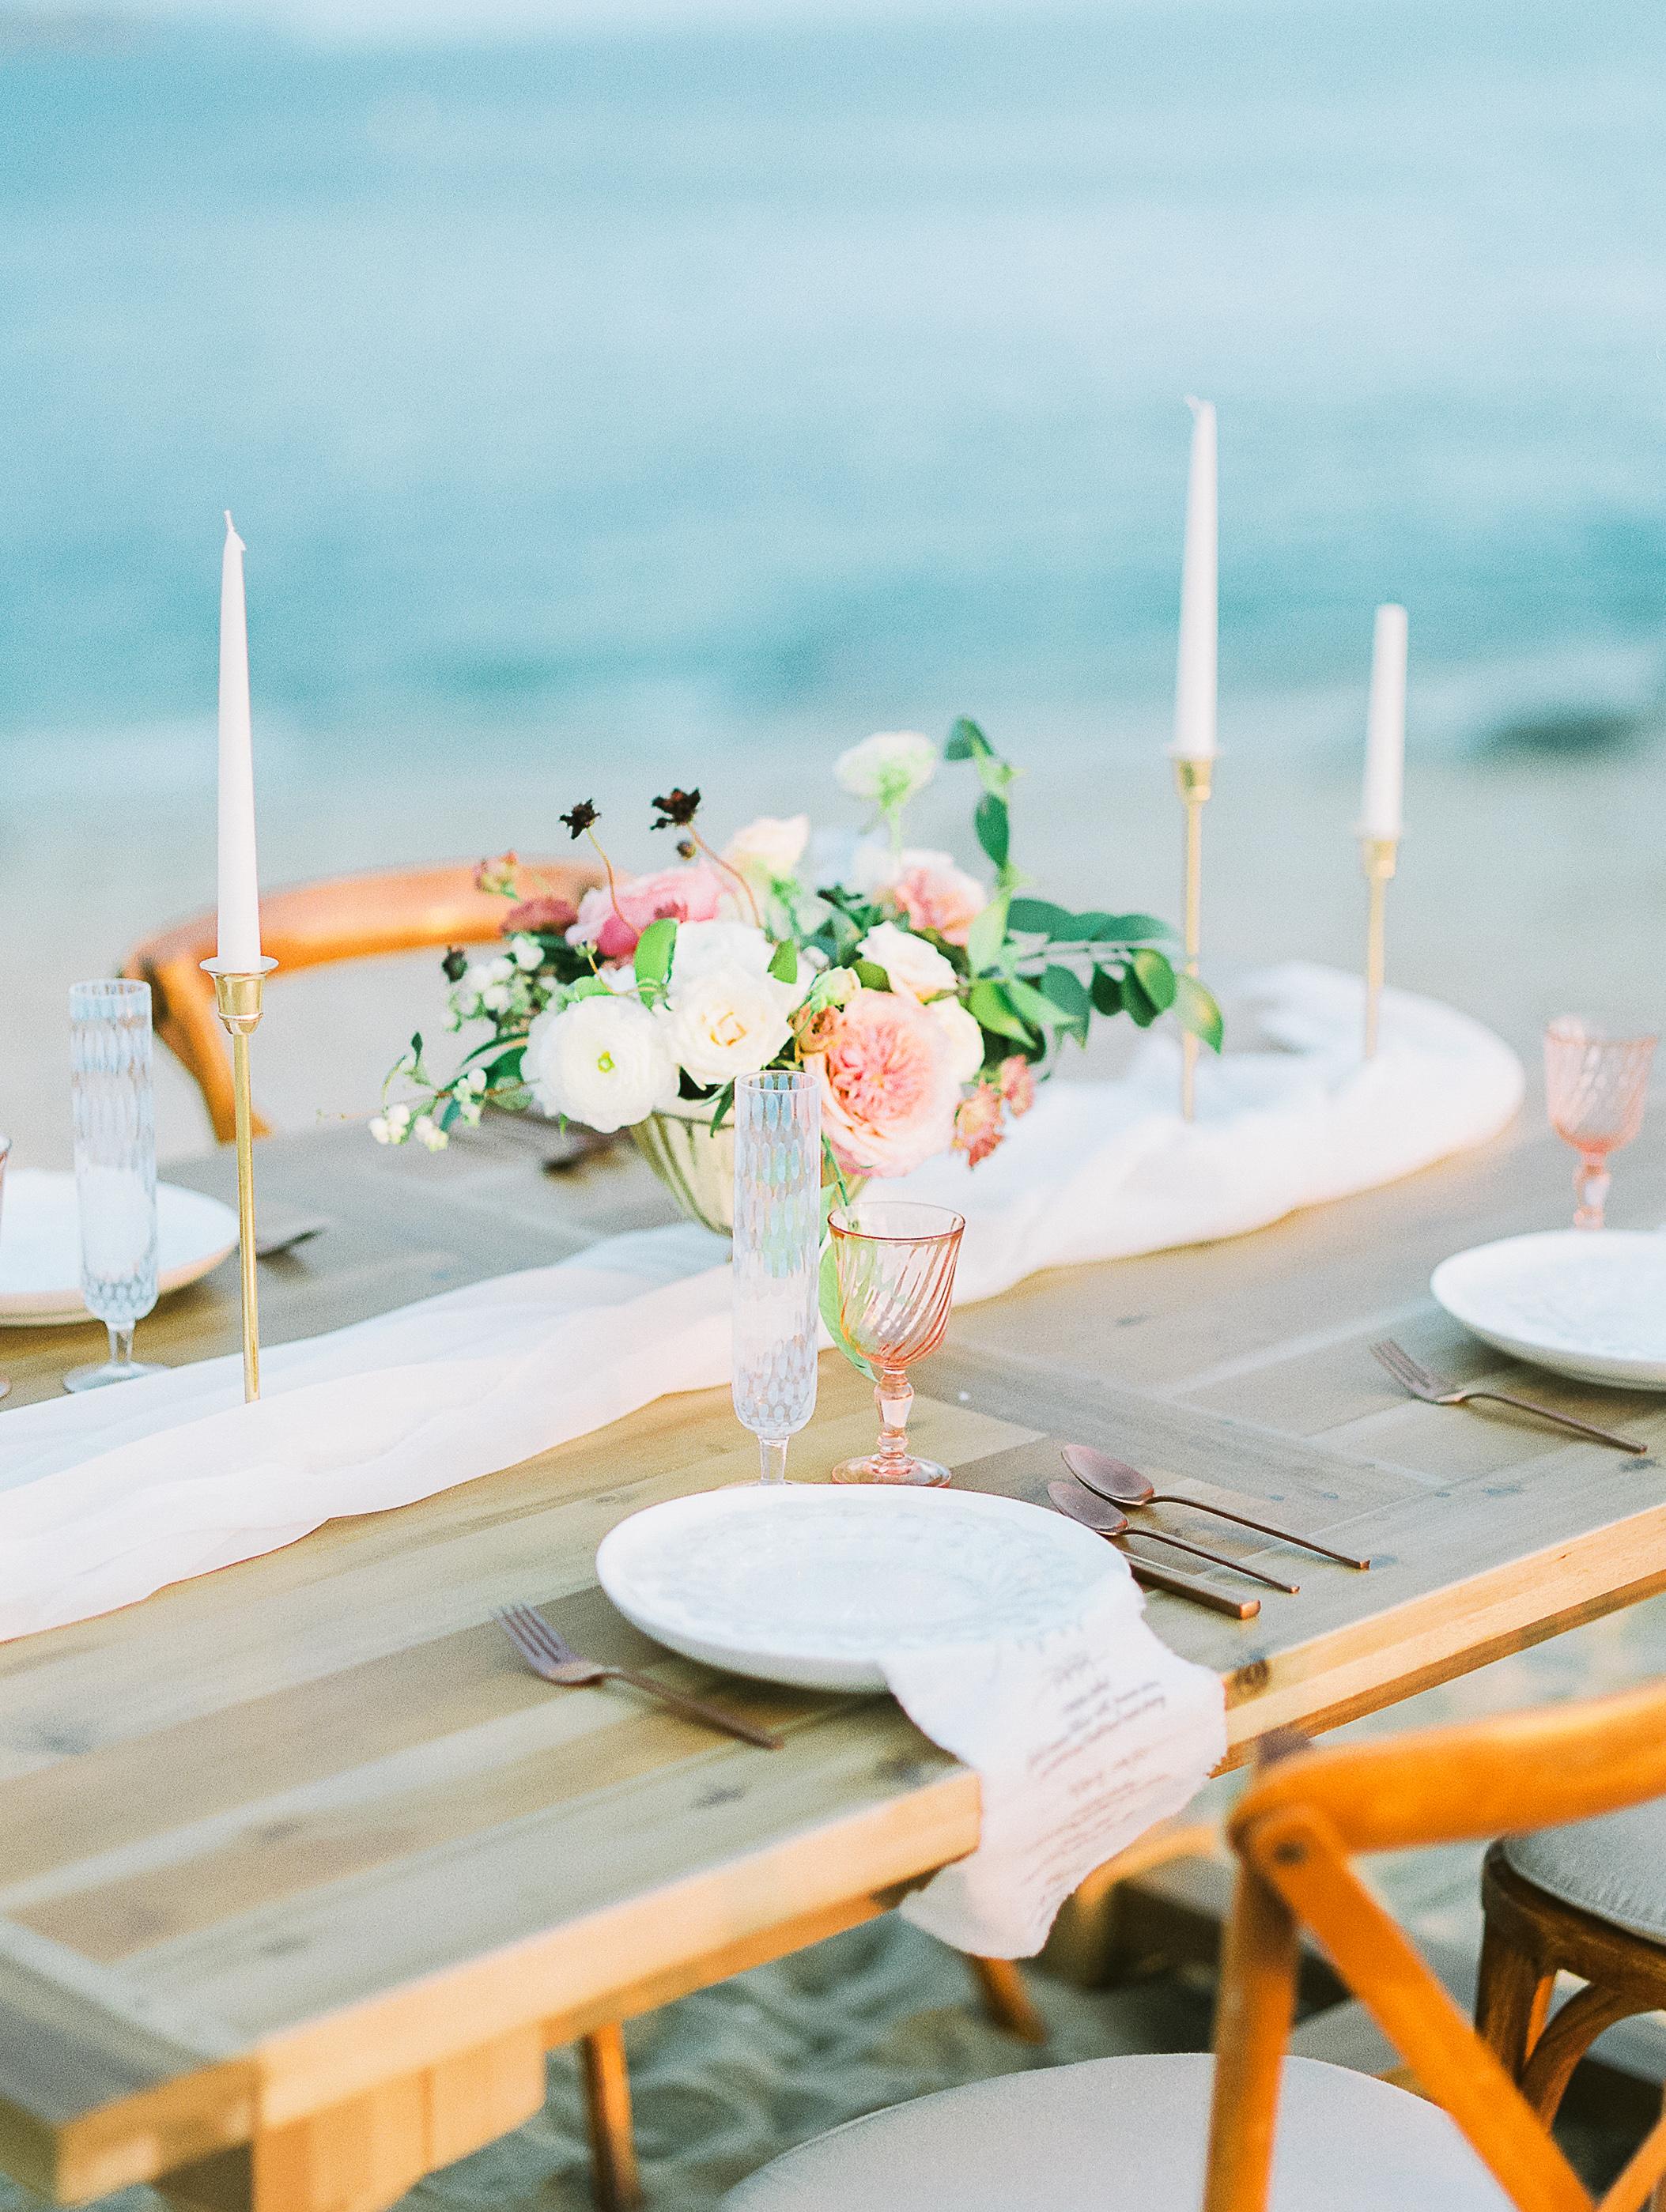 LA-Wedding-Shoot-by-JBJ-Pictures-329.jpg